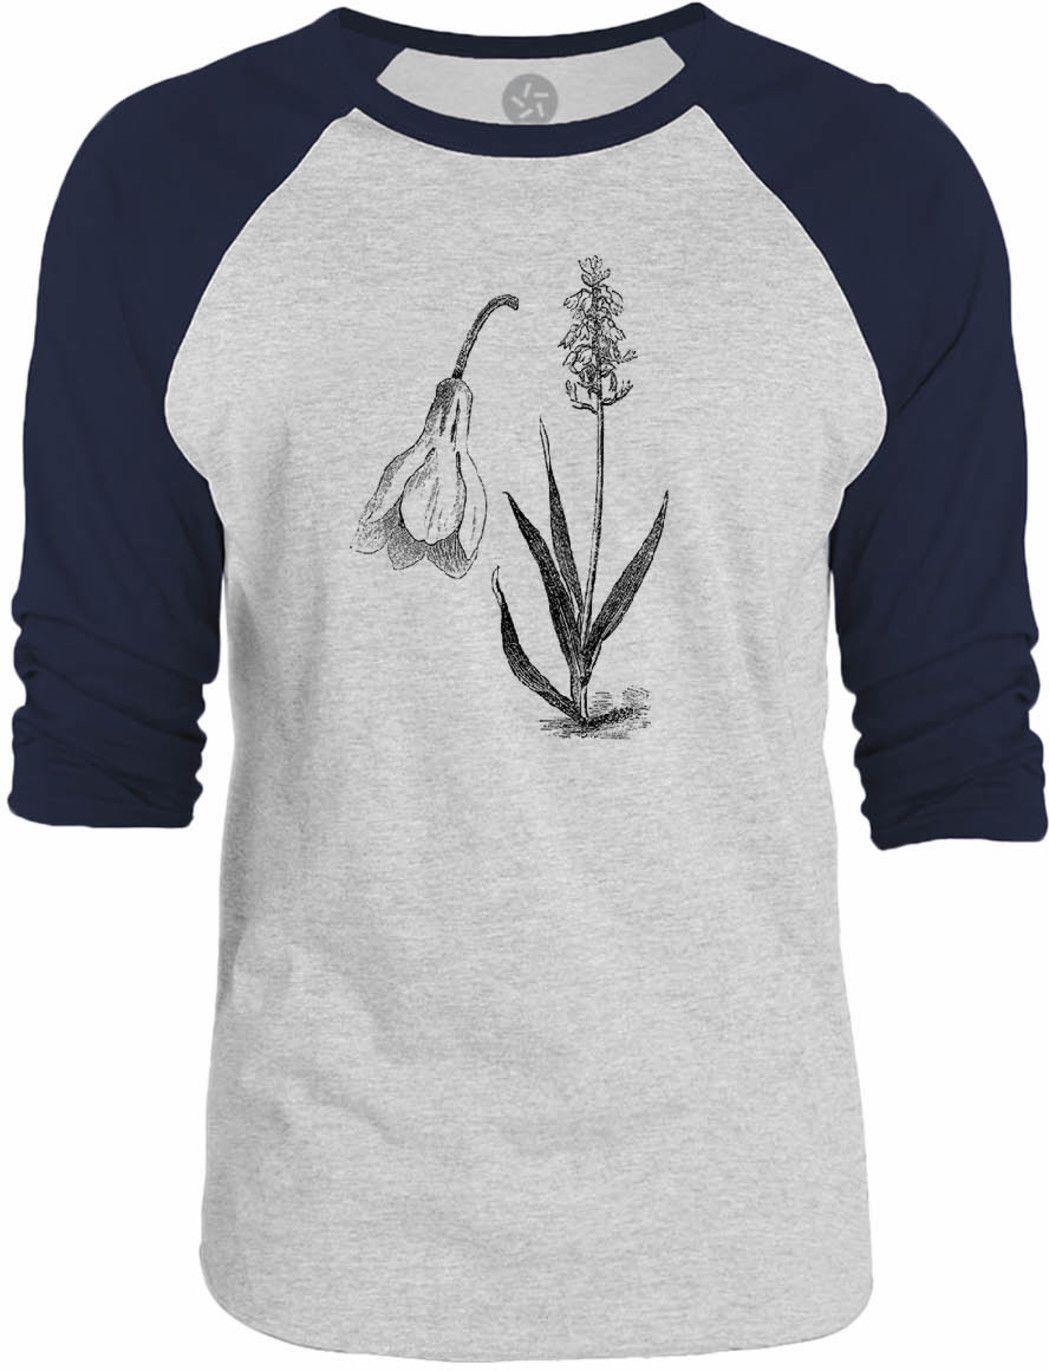 Big Texas Historical Flower Diagram 3/4-Sleeve Raglan Baseball T-Shirt